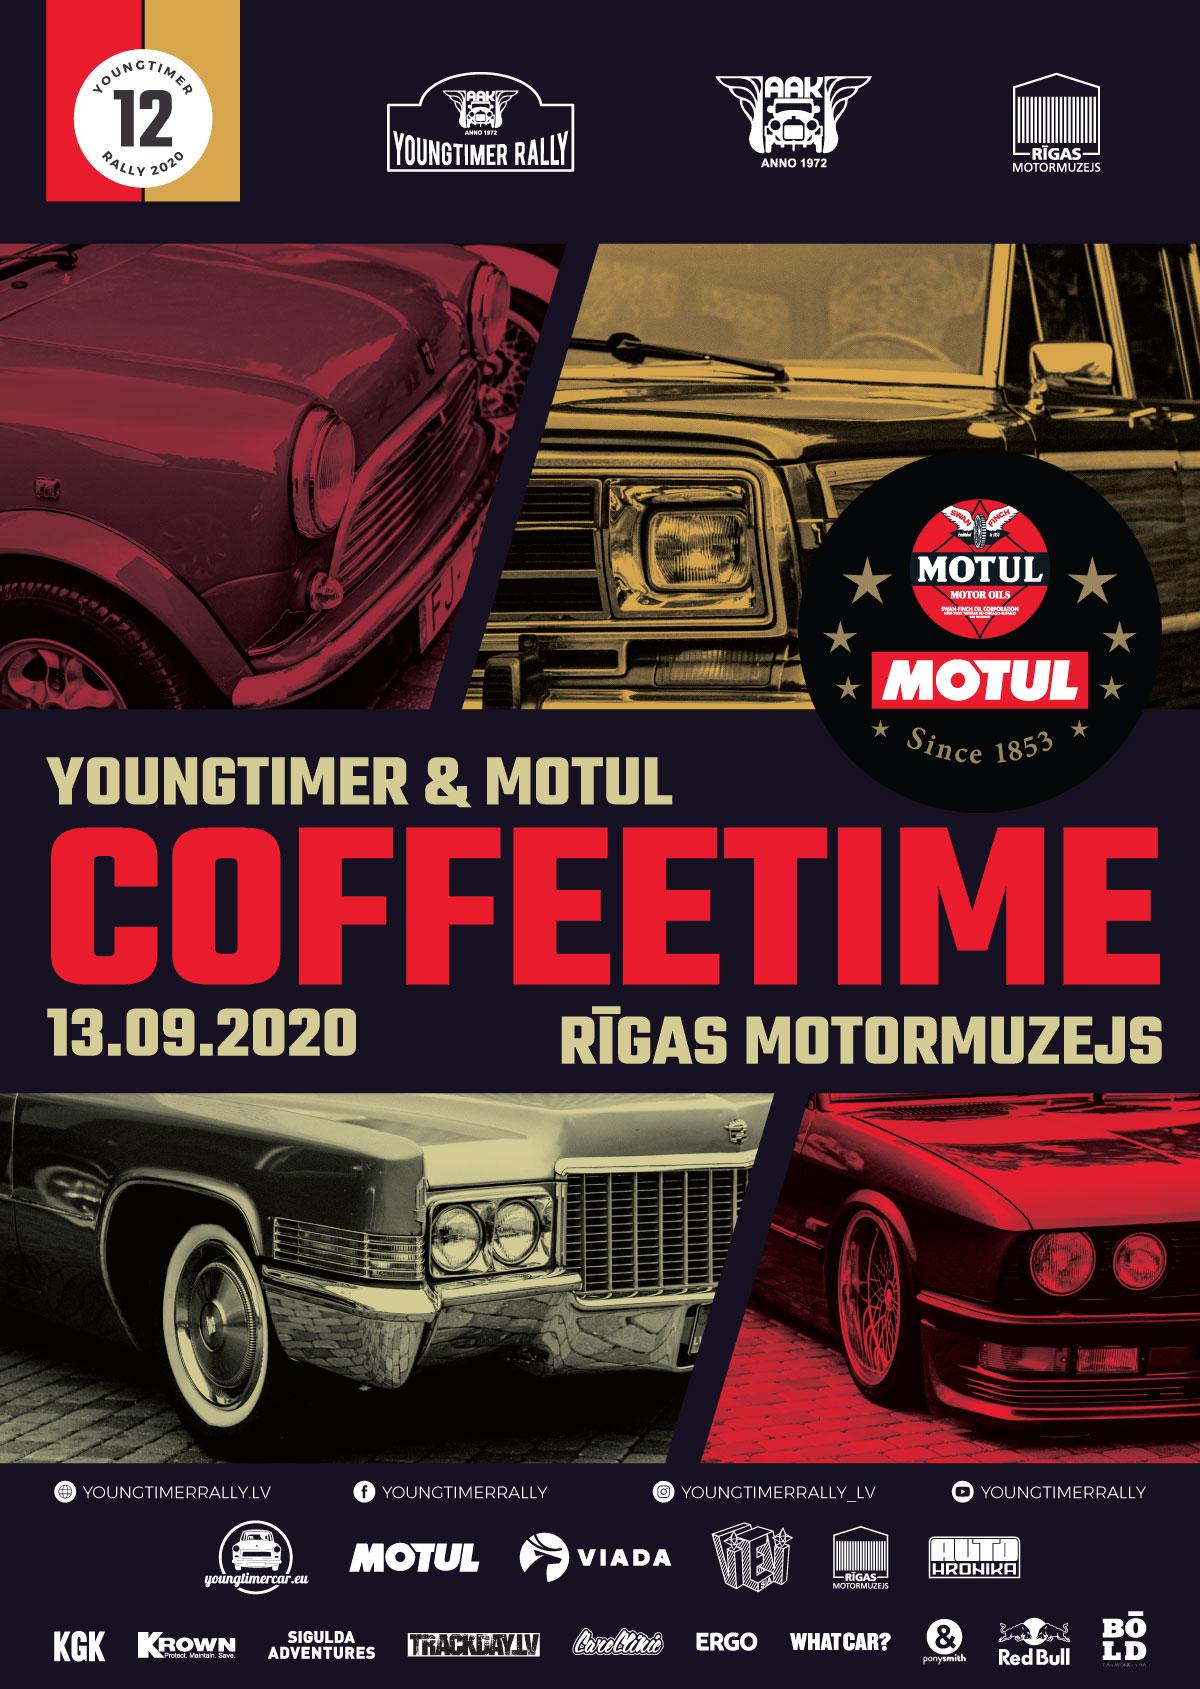 Youngtimer & Motul Coffeetime 2020